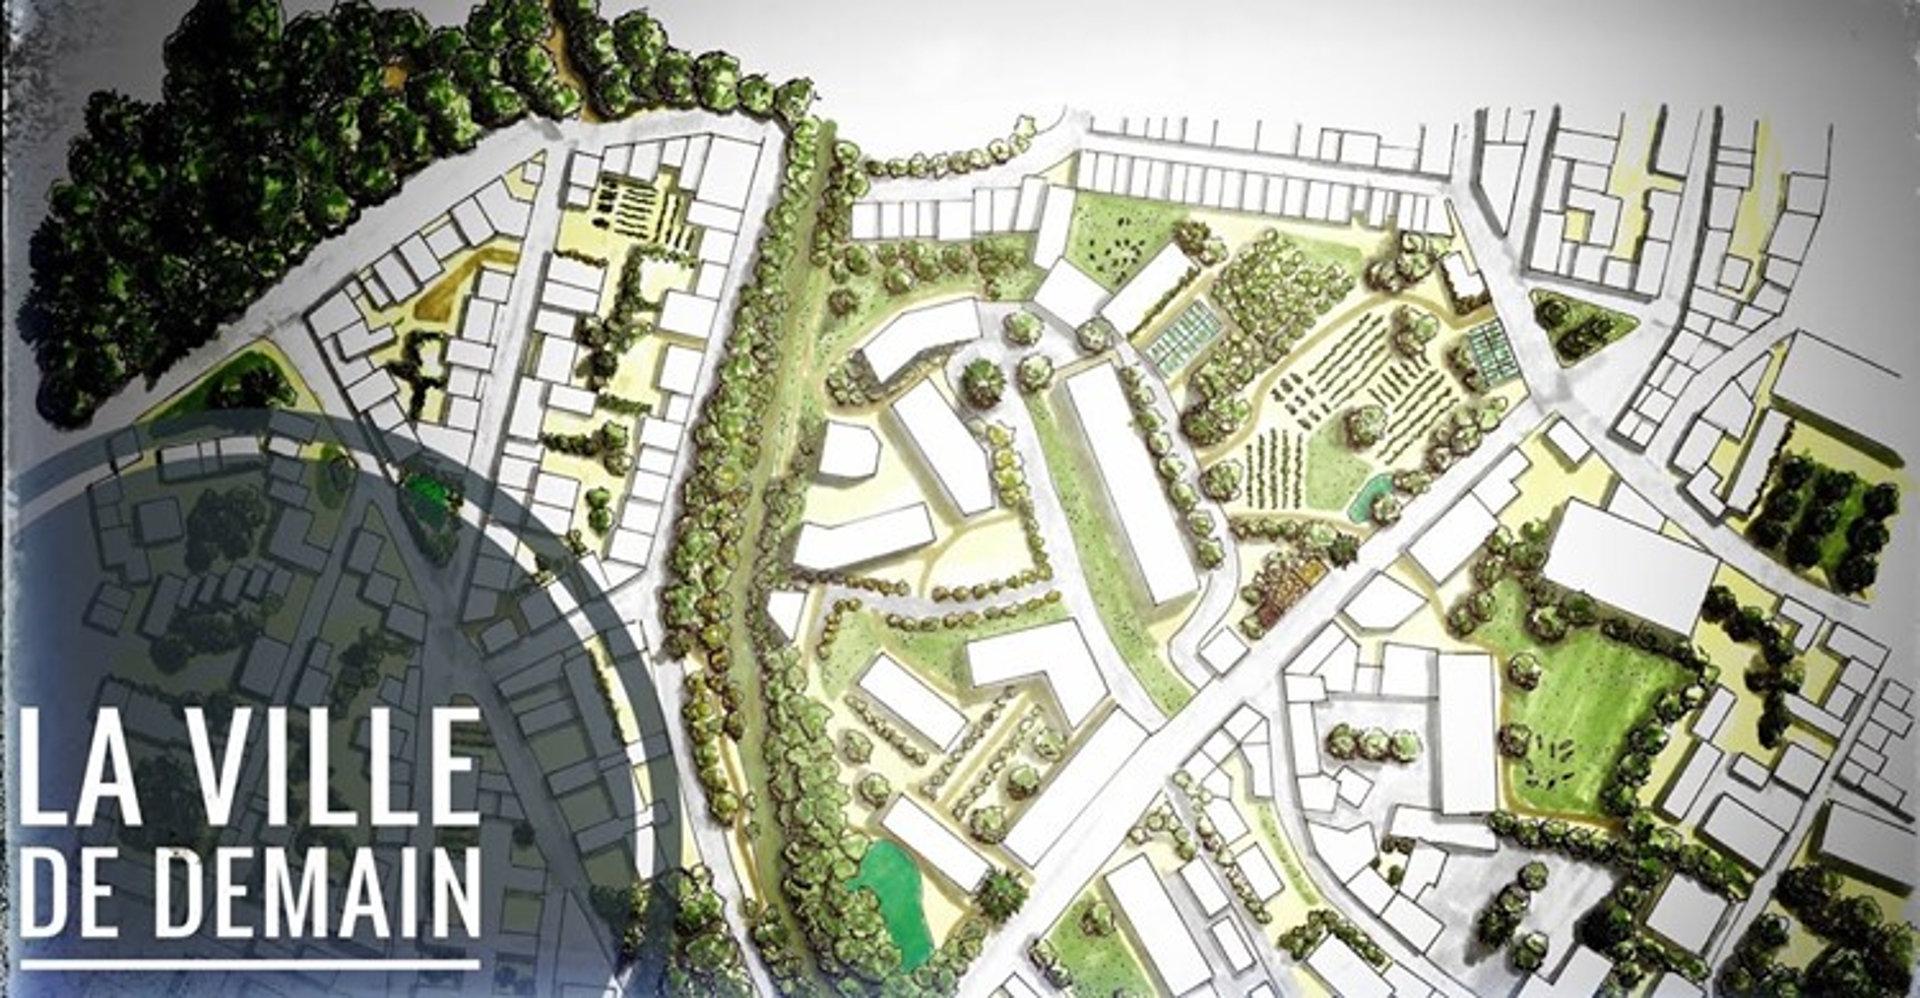 ville-demain-agriculture-permaculture-urbaine